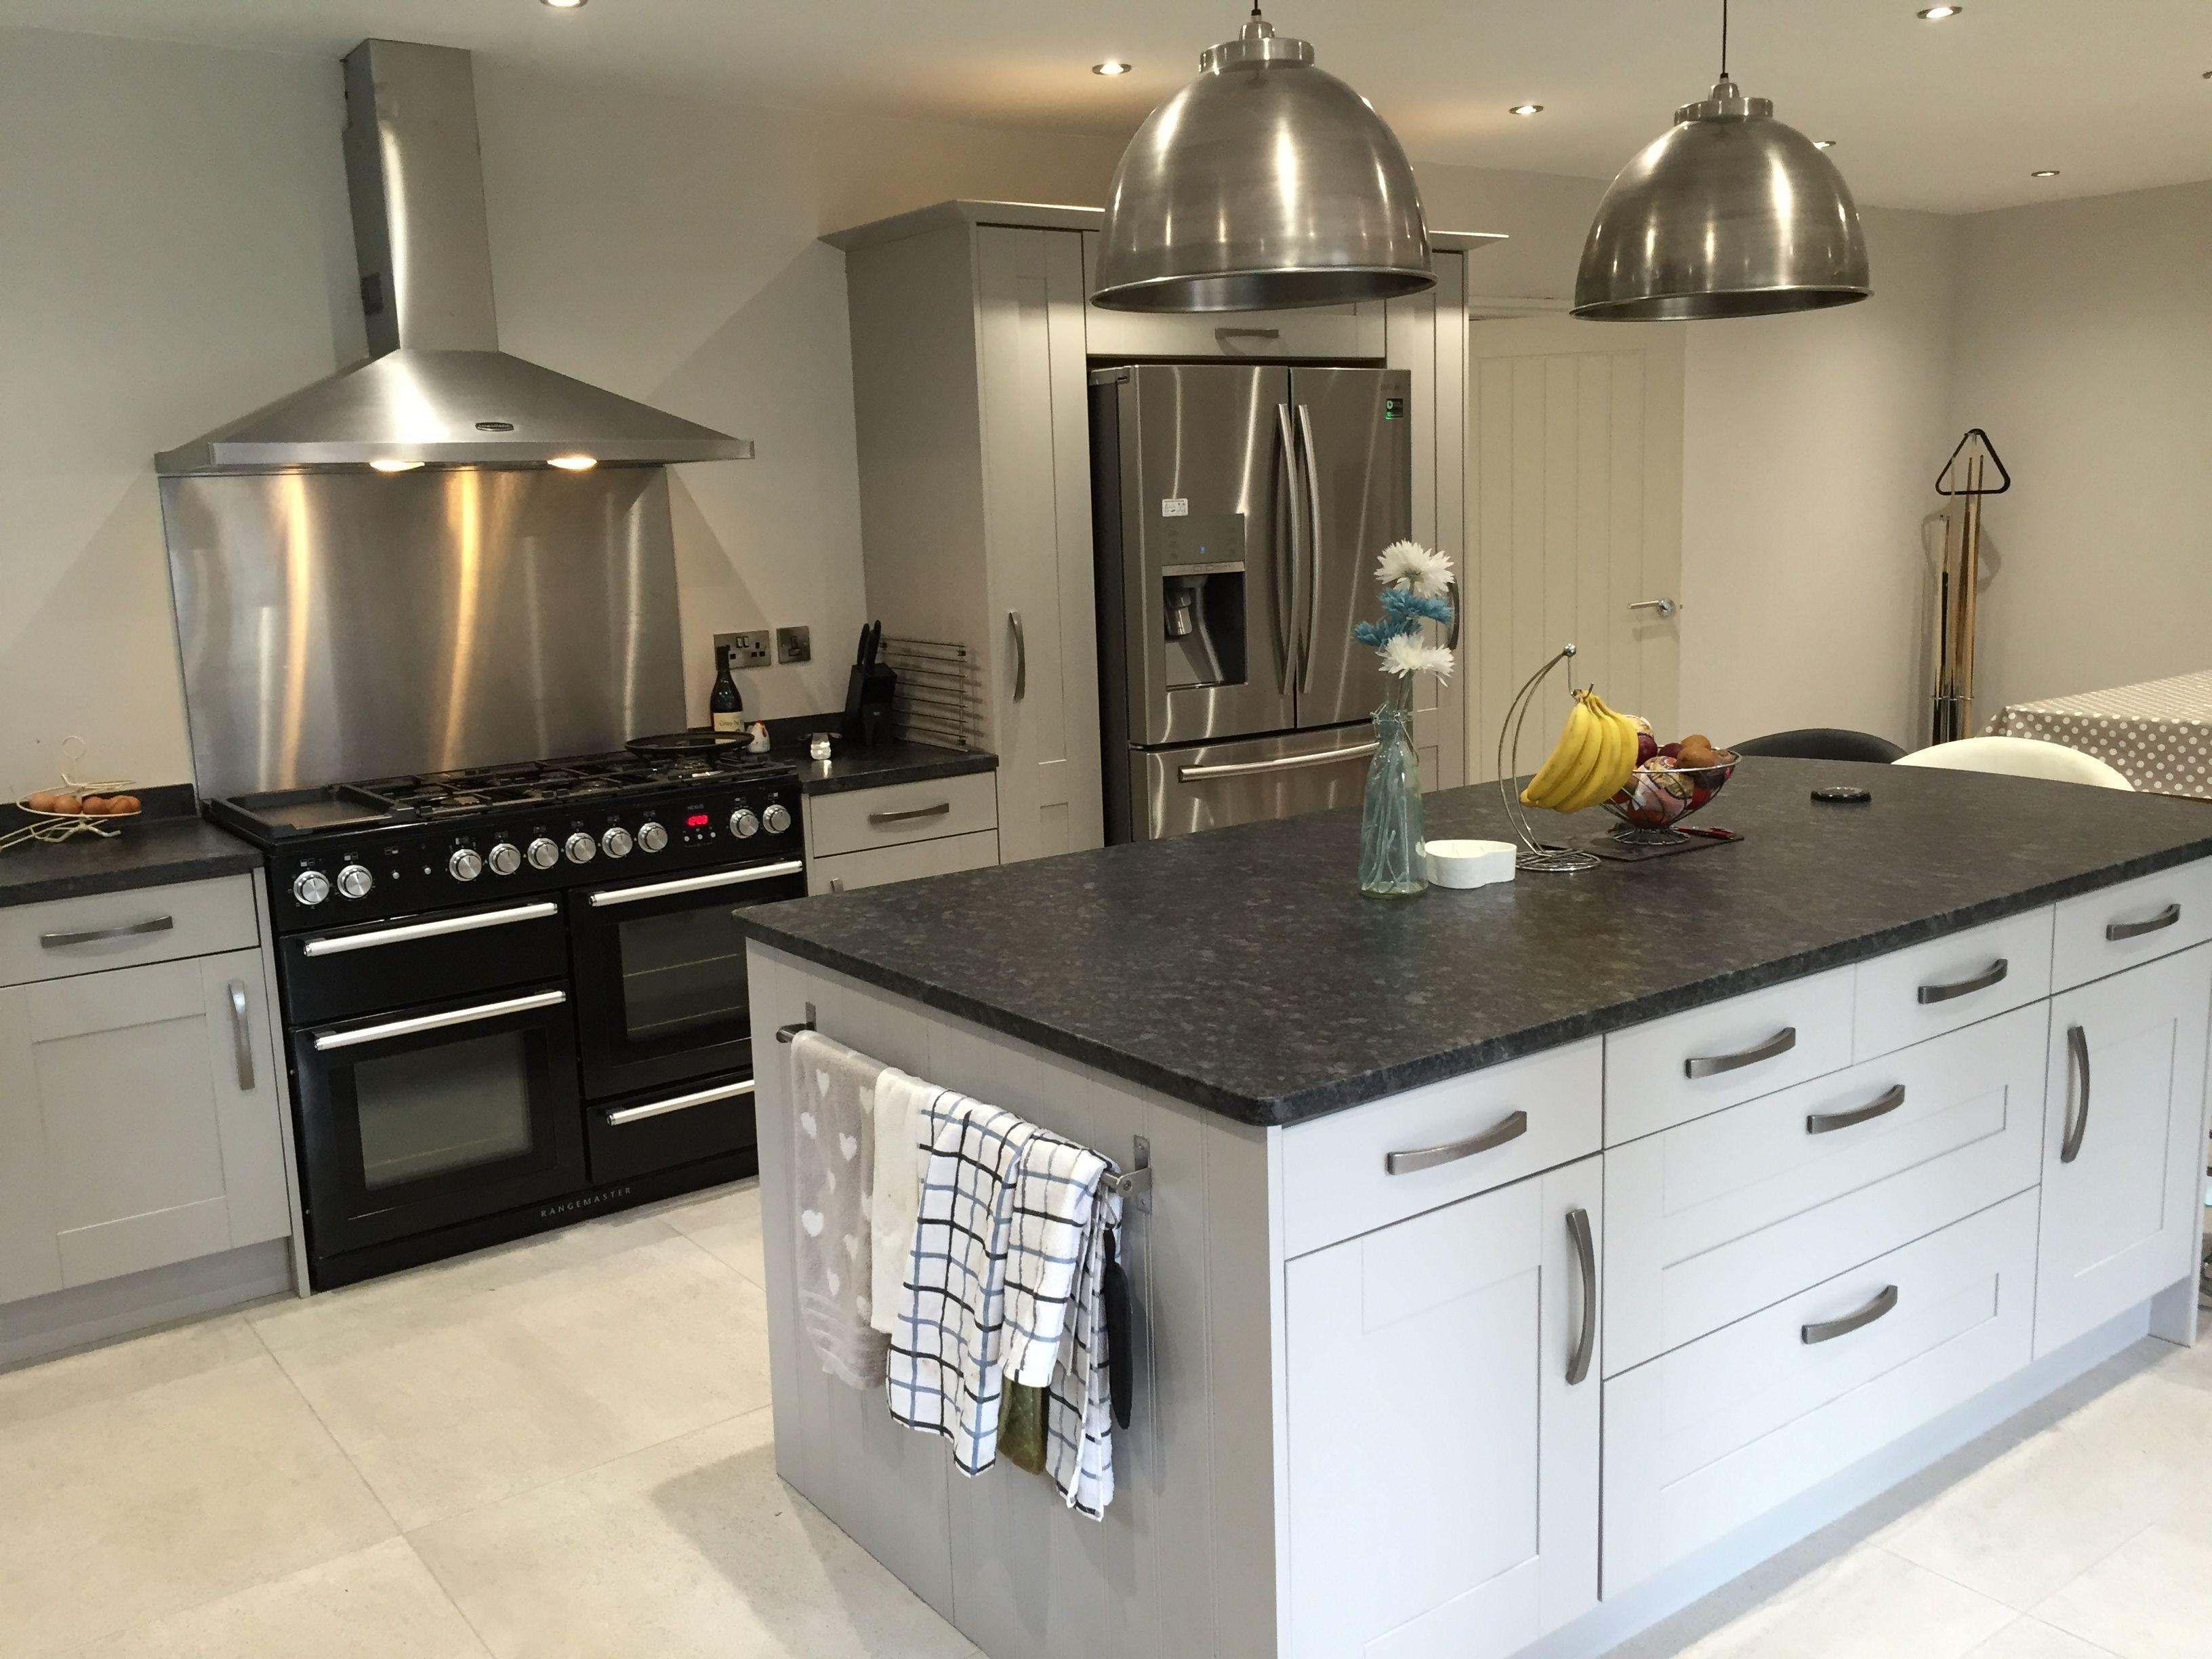 Leathered Quartz Countertops Vs Granite